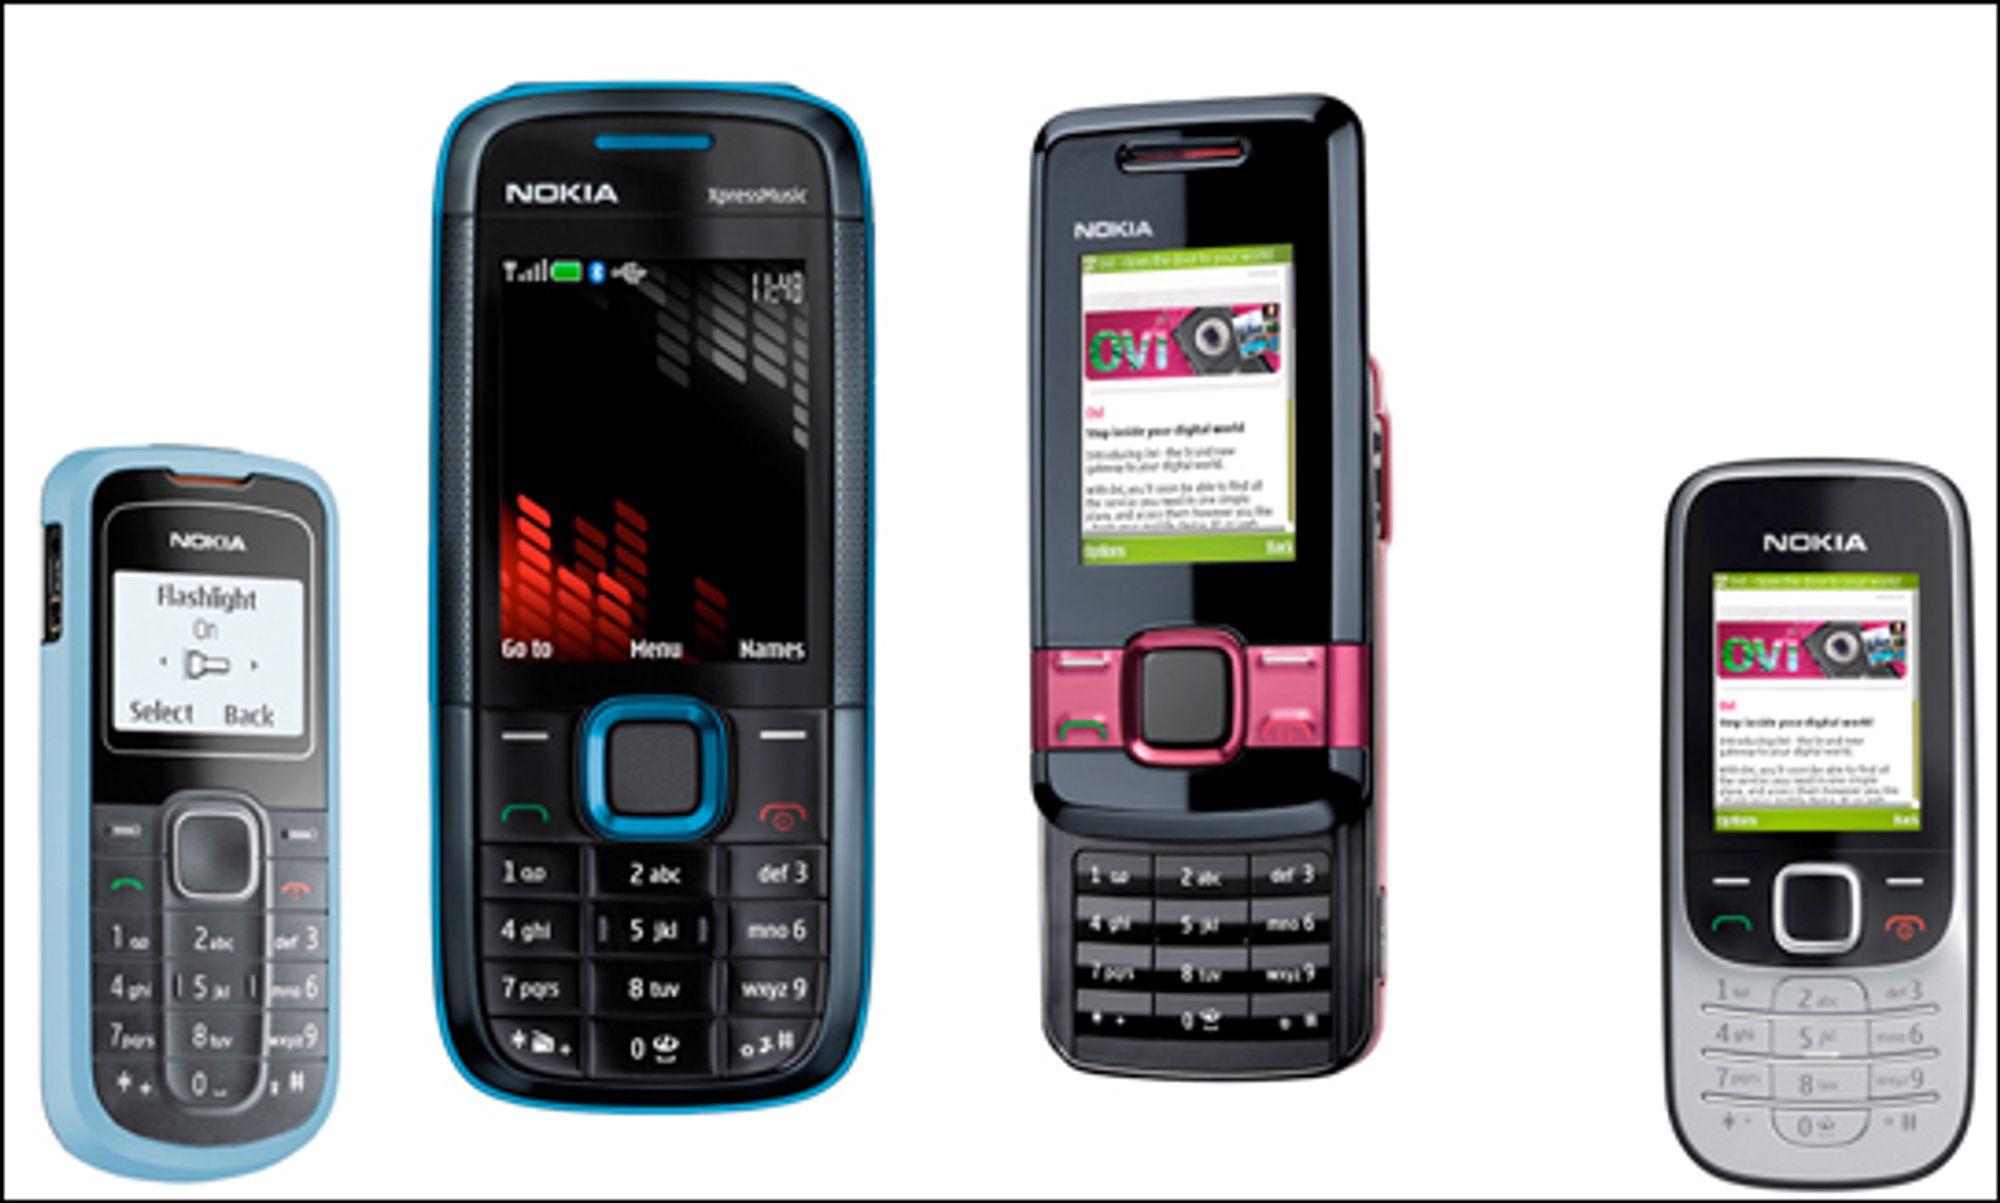 Nokia lanserte et lass med billigtelefoner denne uken. (Foto: Nokia)